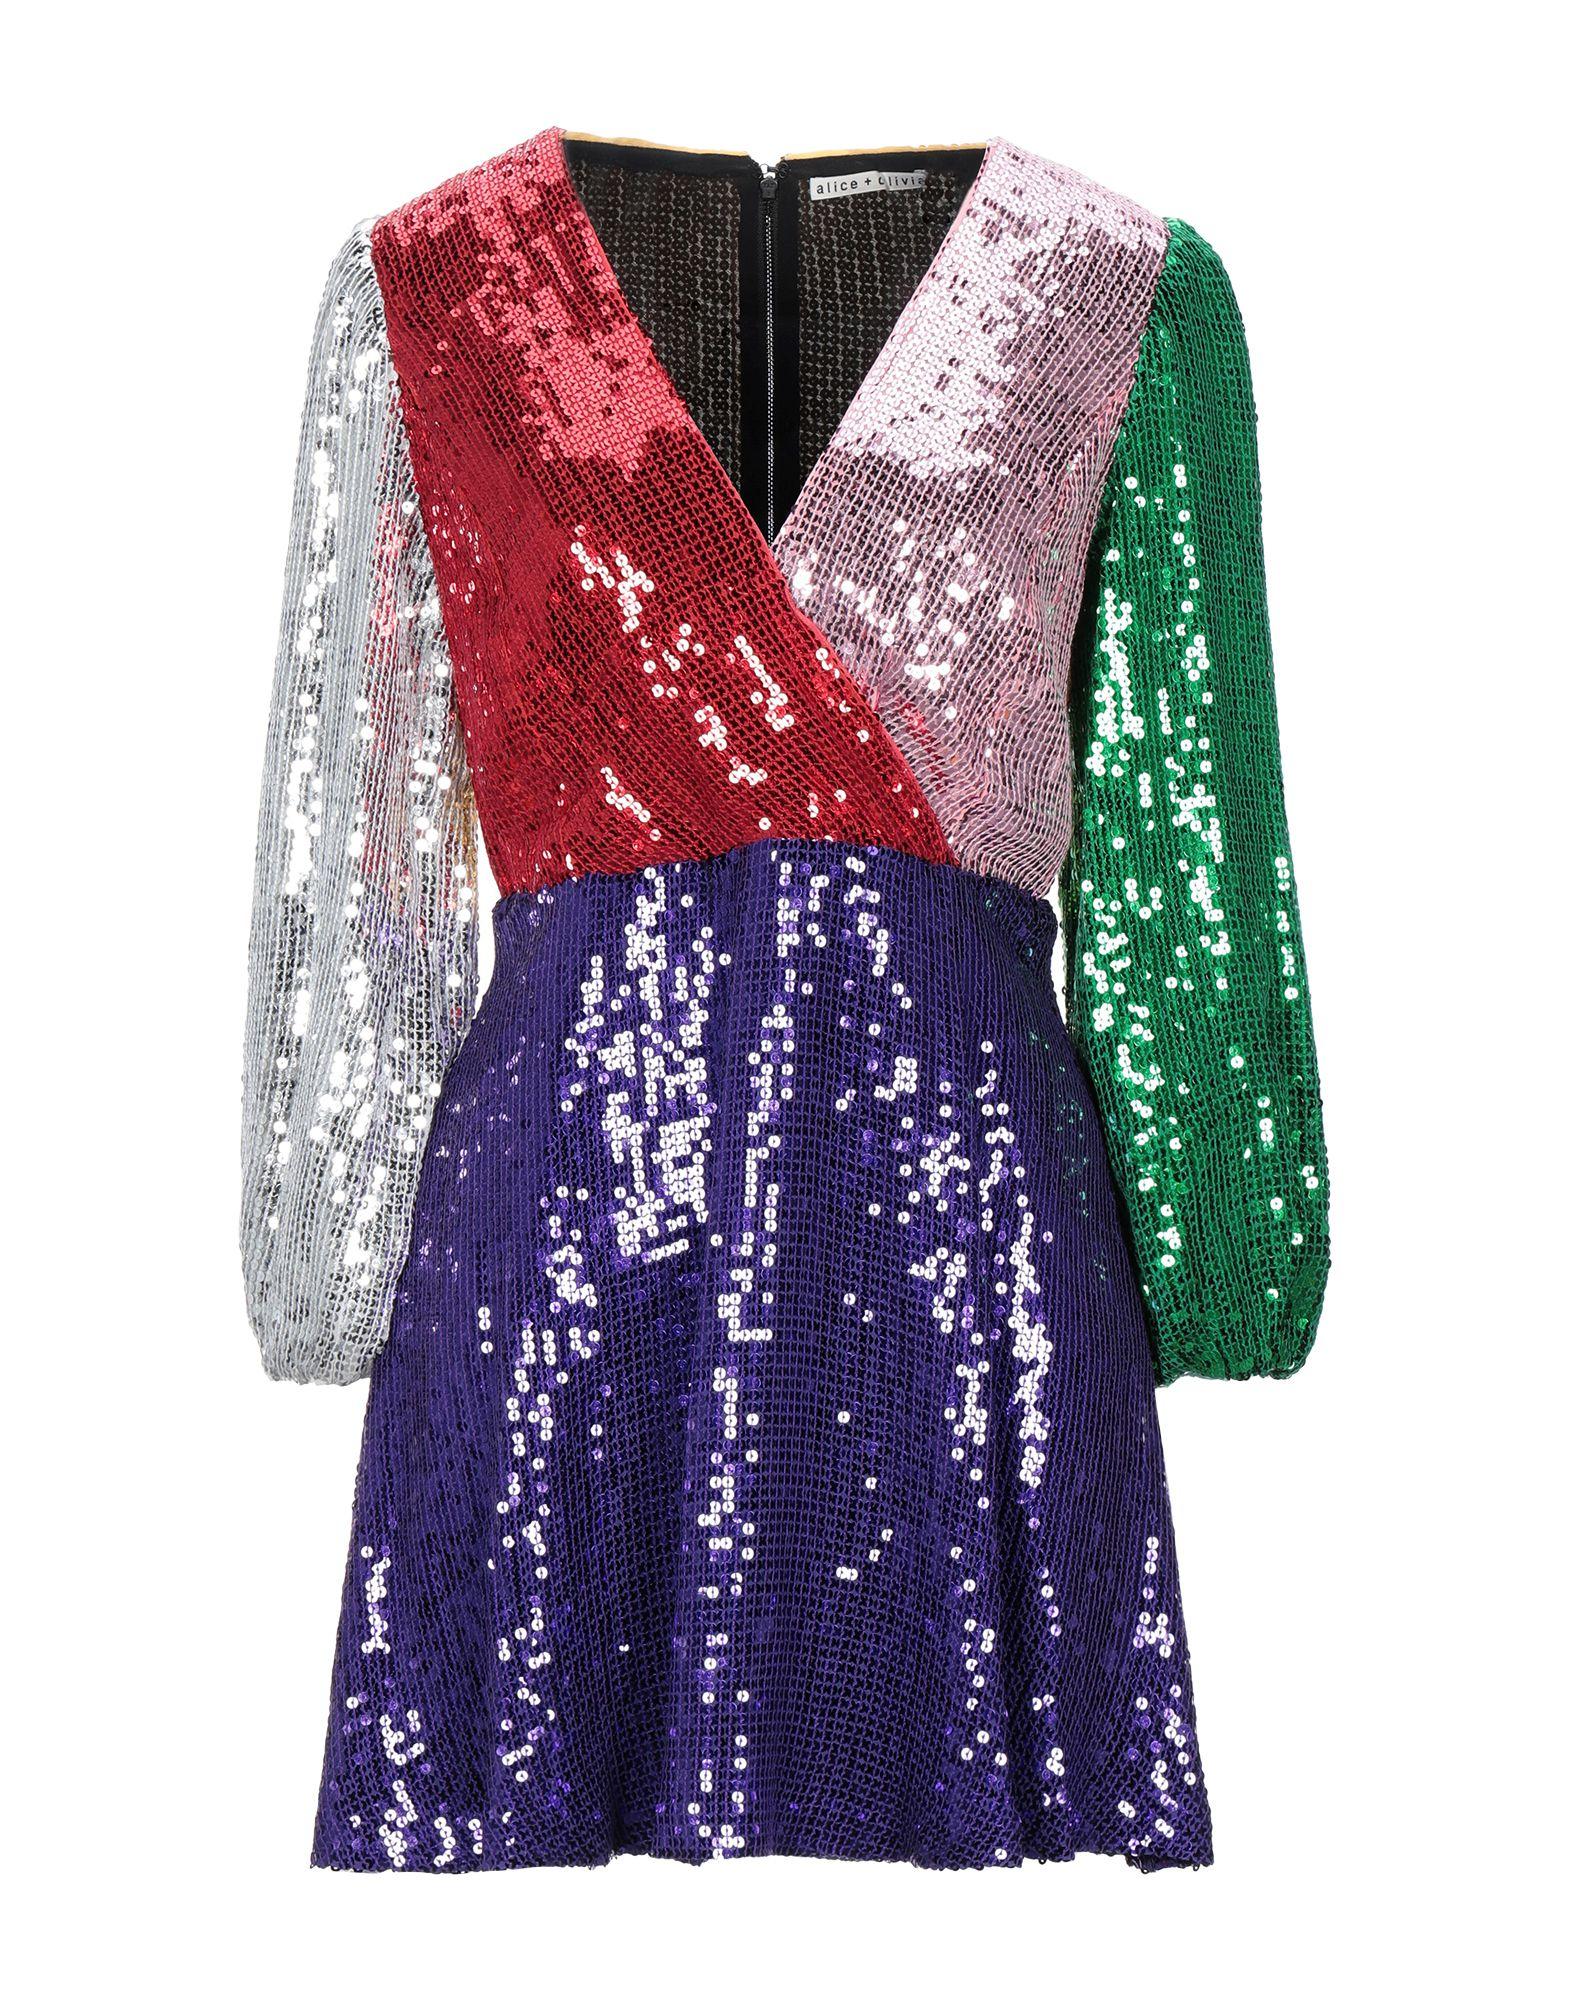 ALICE + OLIVIA Short dresses. crepe, sequins, multicolor pattern, deep neckline, long sleeves, no pockets, rear closure, zipper closure, fully lined. 100% Viscose